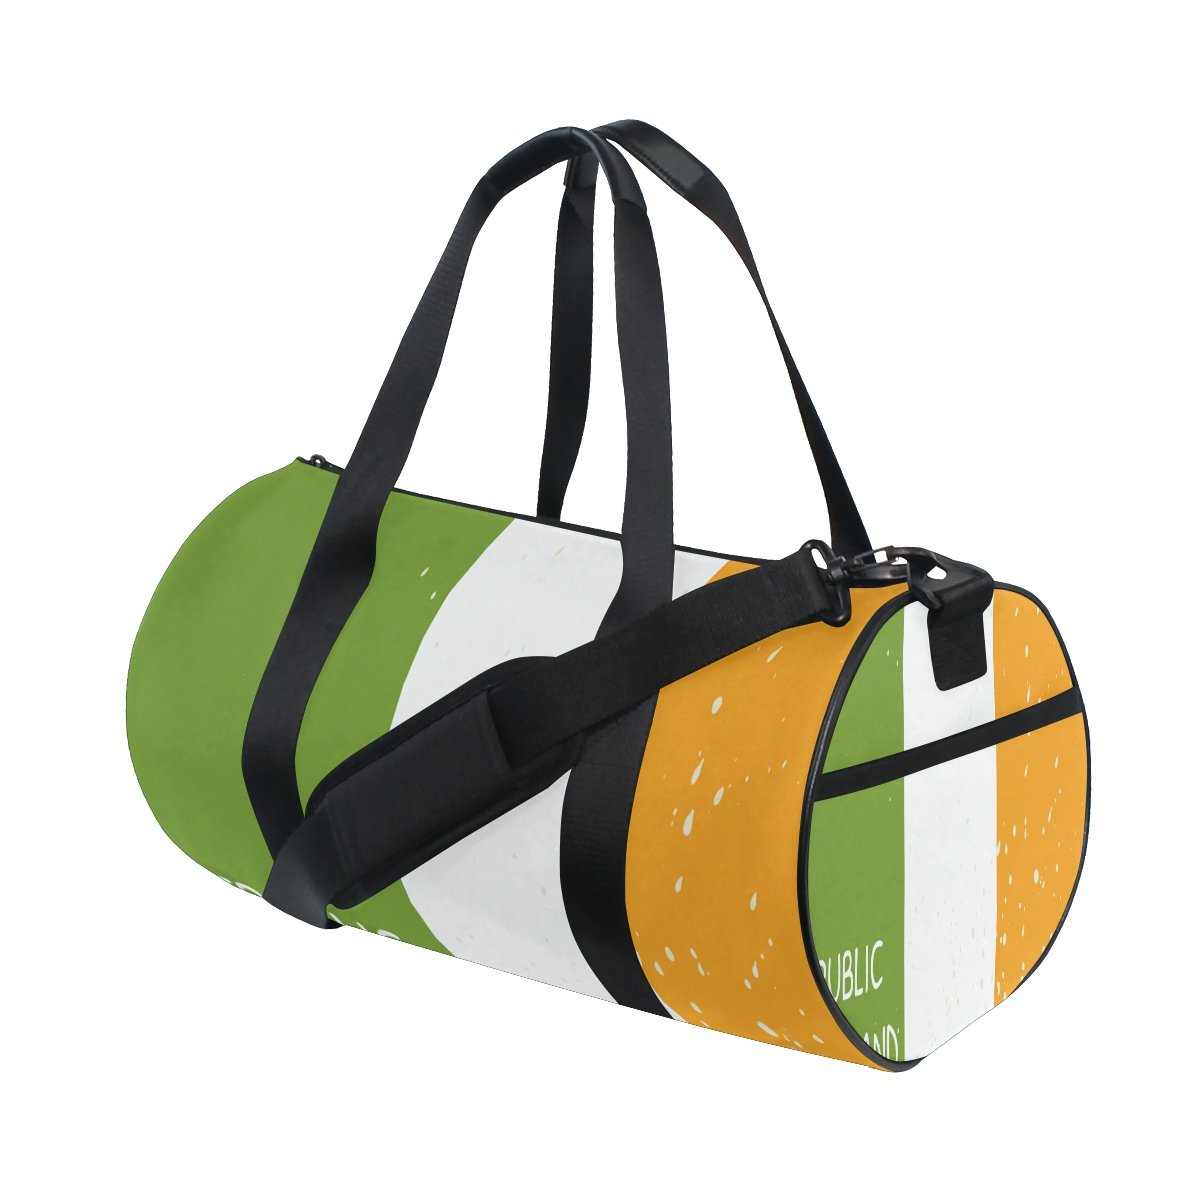 Distressed Republic Of Ireland Flag Travel Duffel Shoulder Bag ,Sports Gym Fitness Bags